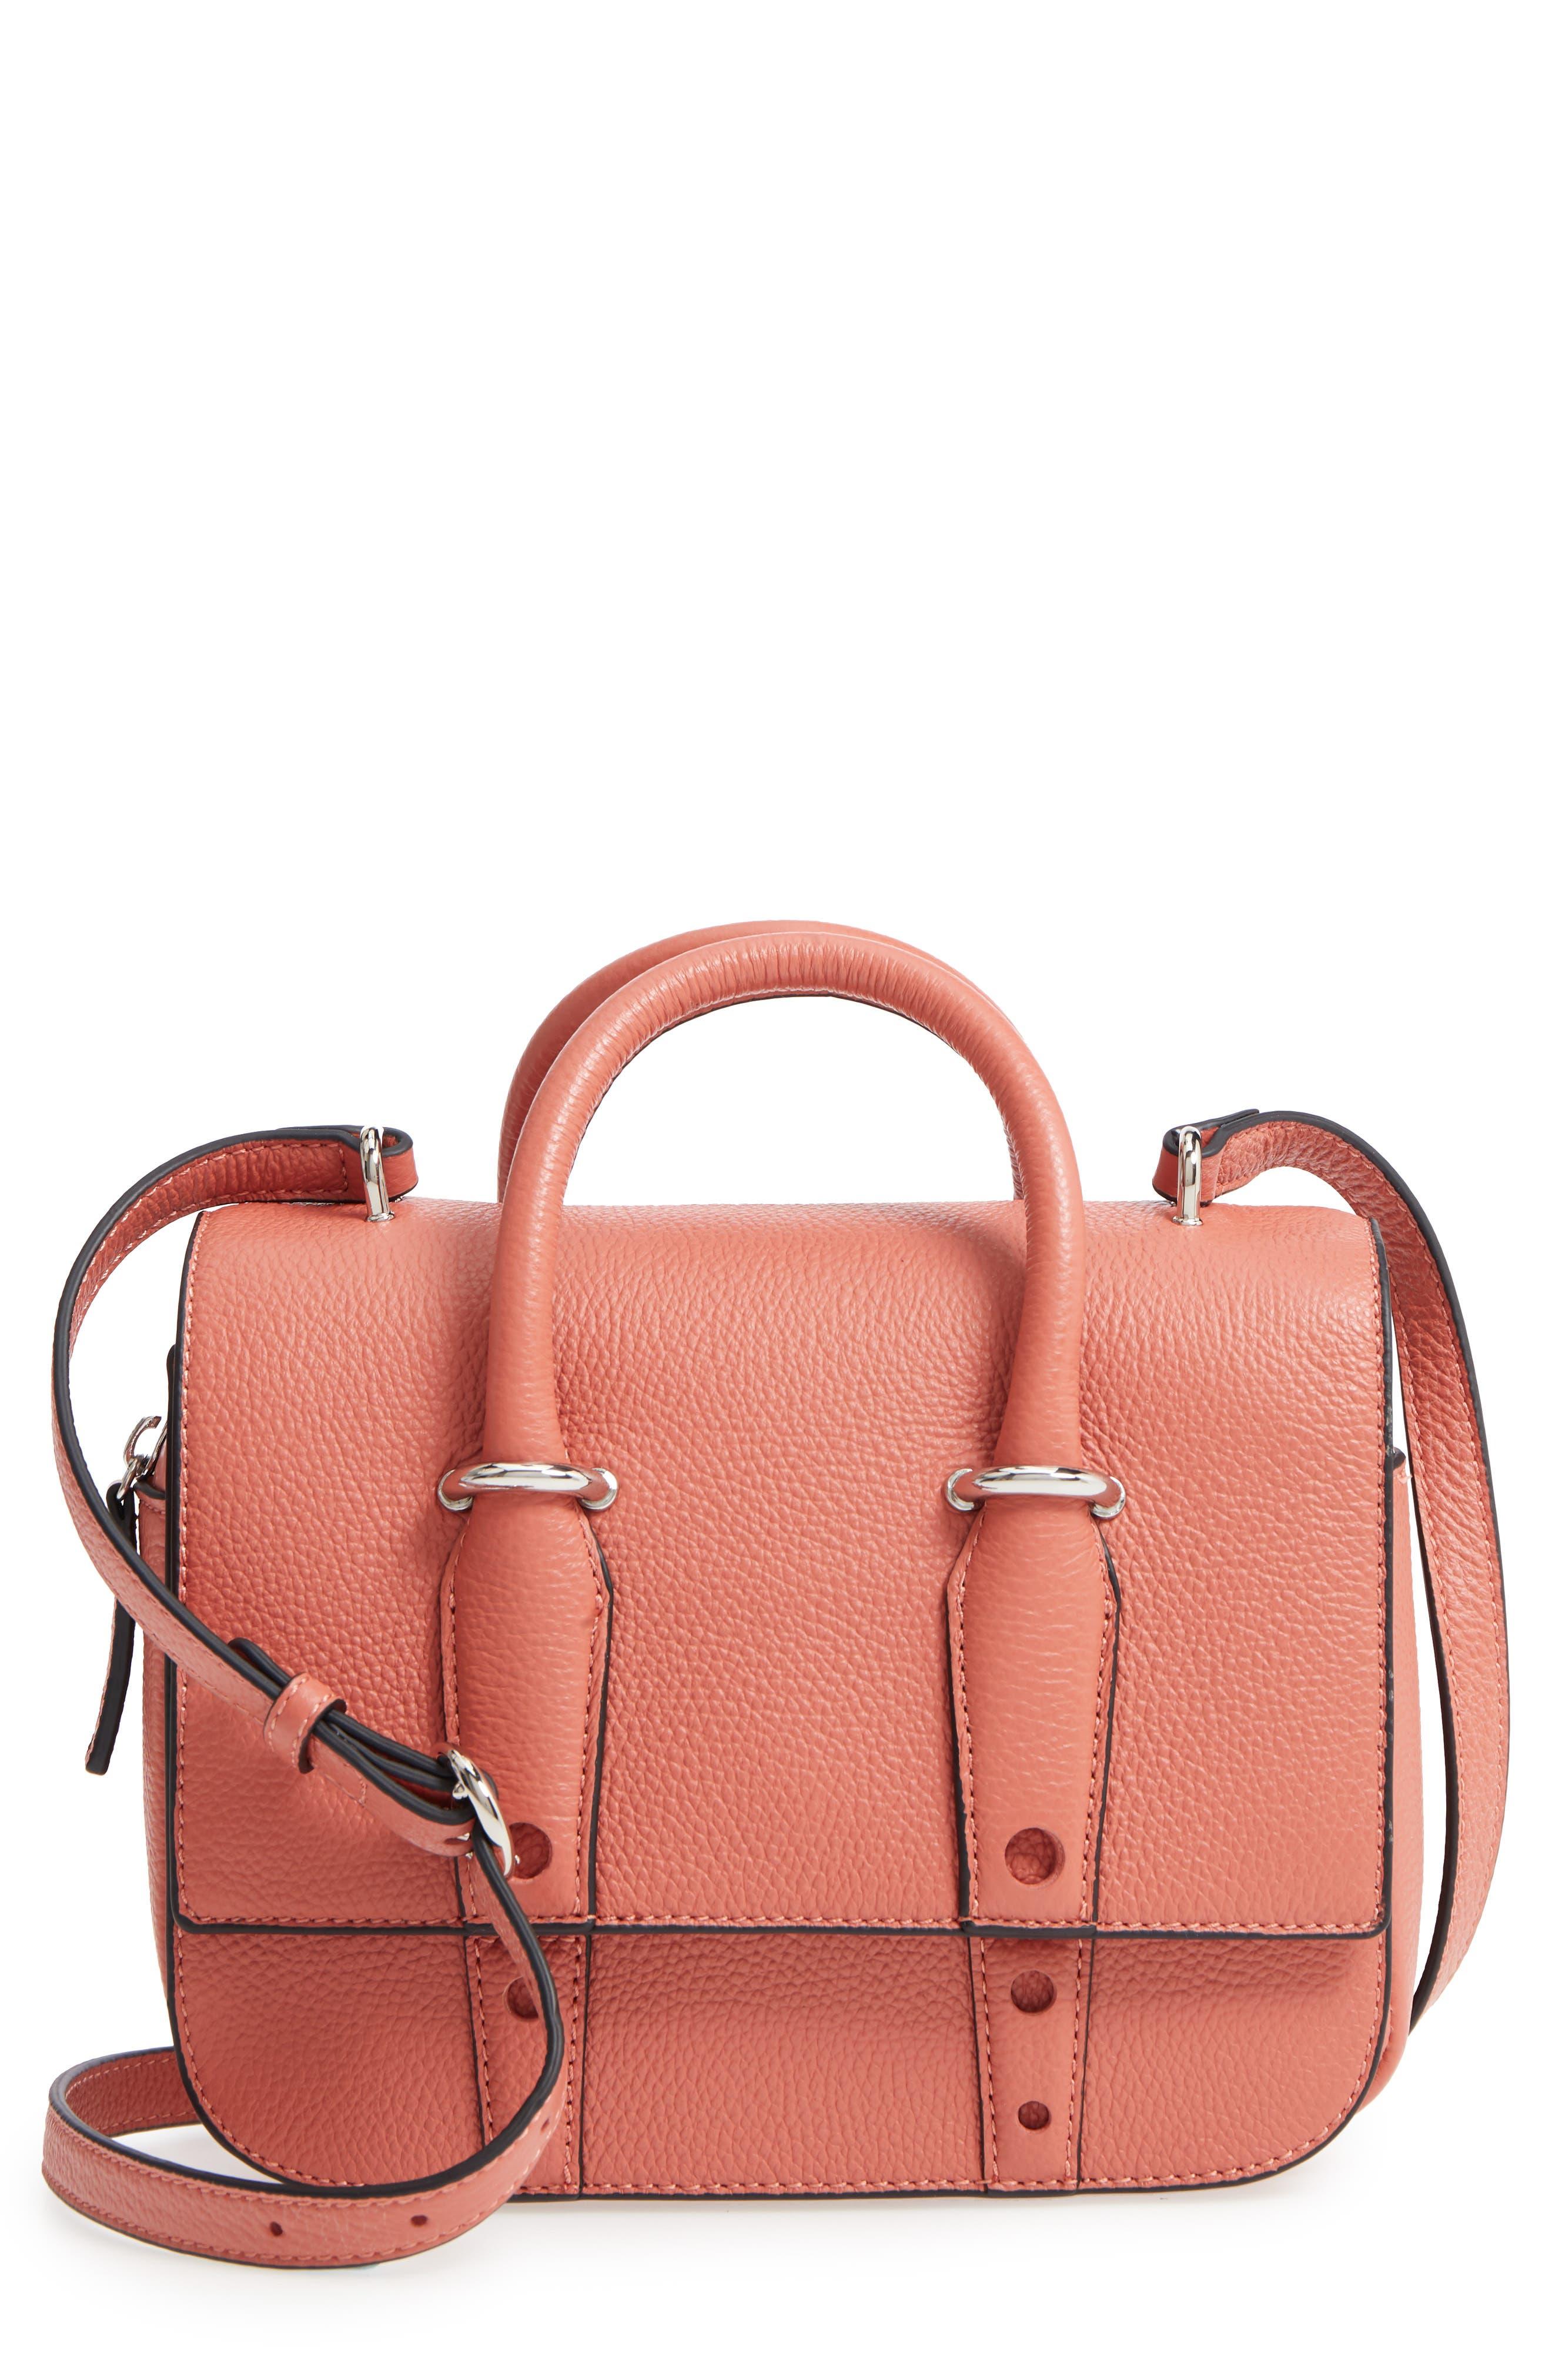 DANIELLE NICOLE,                             Kinsley Leather Crossbody Bag,                             Main thumbnail 1, color,                             600